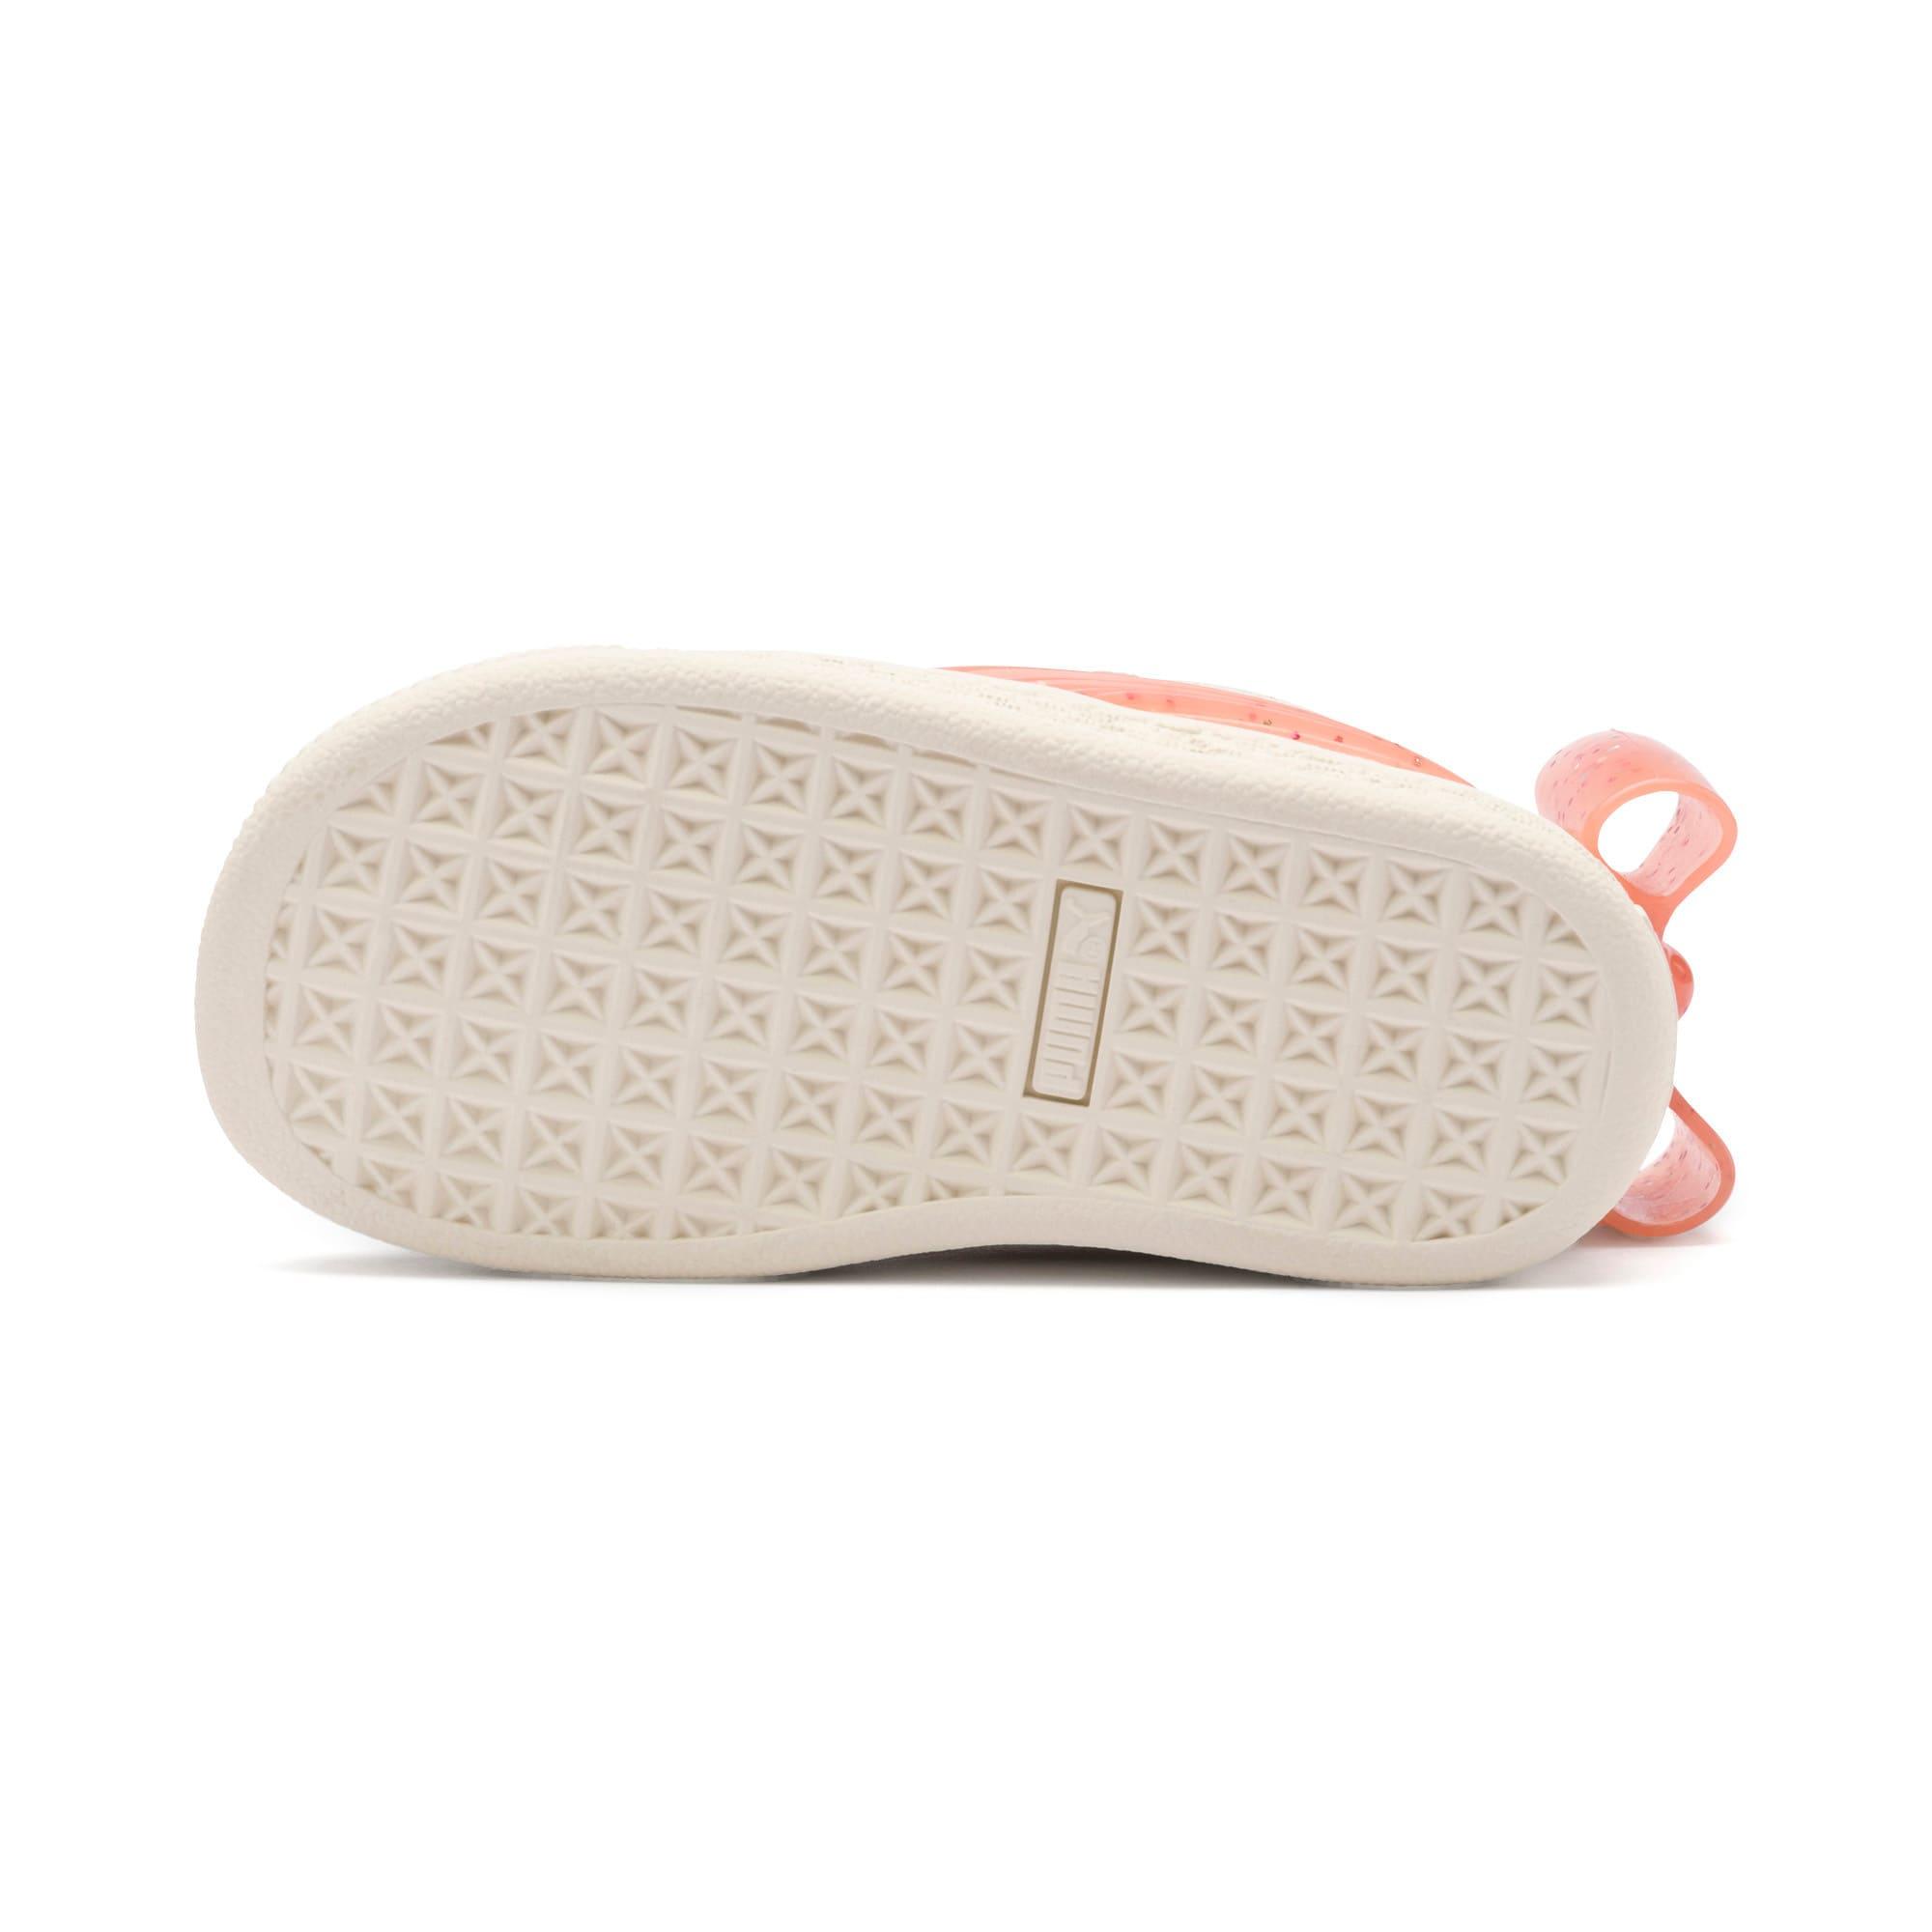 Miniatura 4 de Zapatos Suede Jelly Bow AC para bebé, White-Peach Bud-Silver, mediano